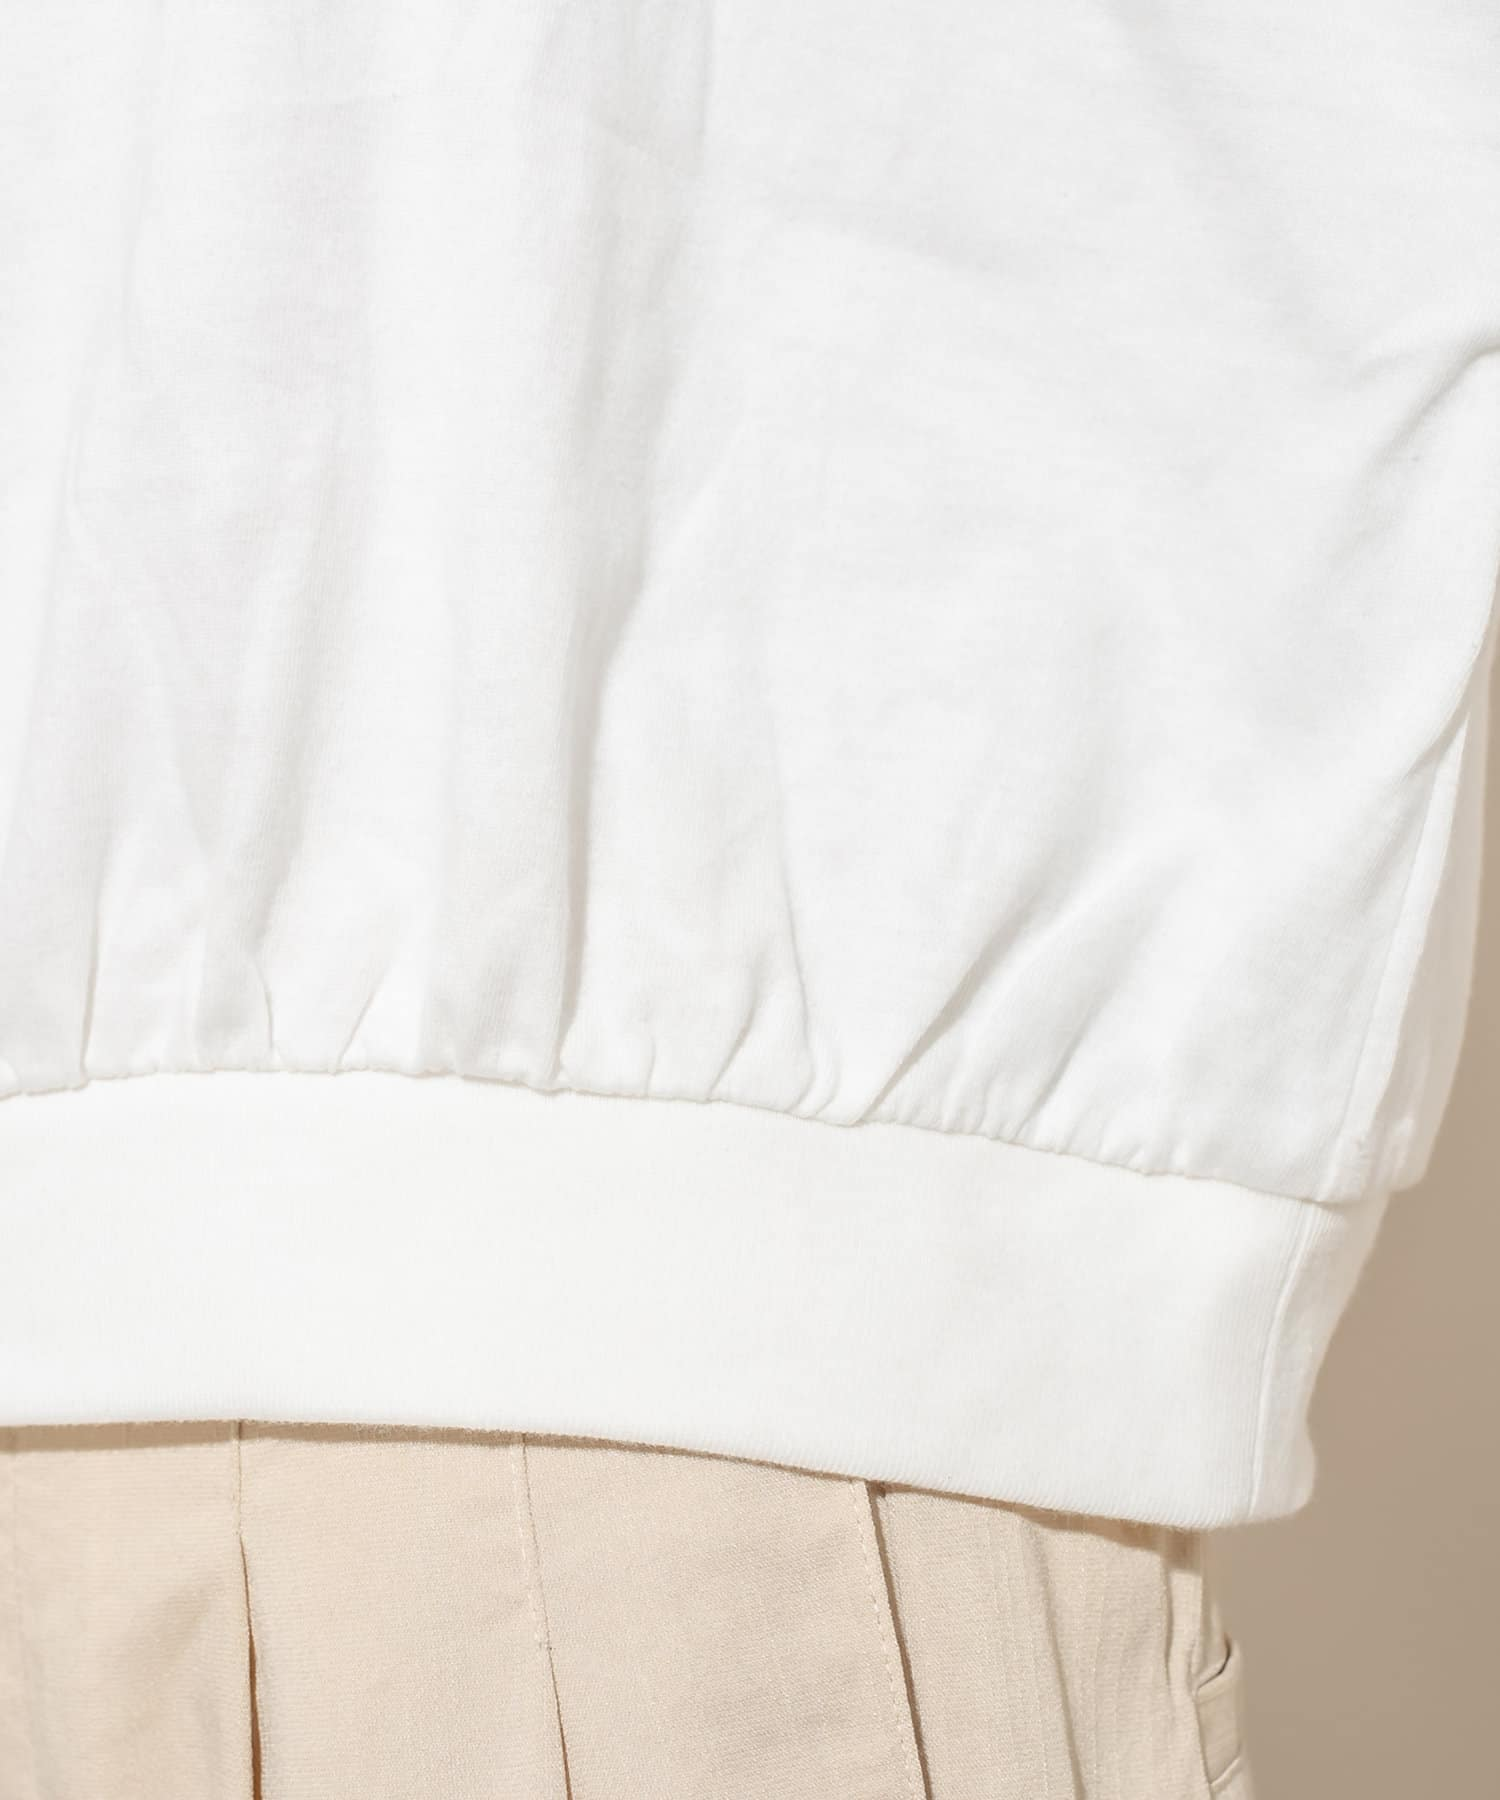 mystic(ミスティック) [mline] WEB限定 刺繍ボリュームTシャツ